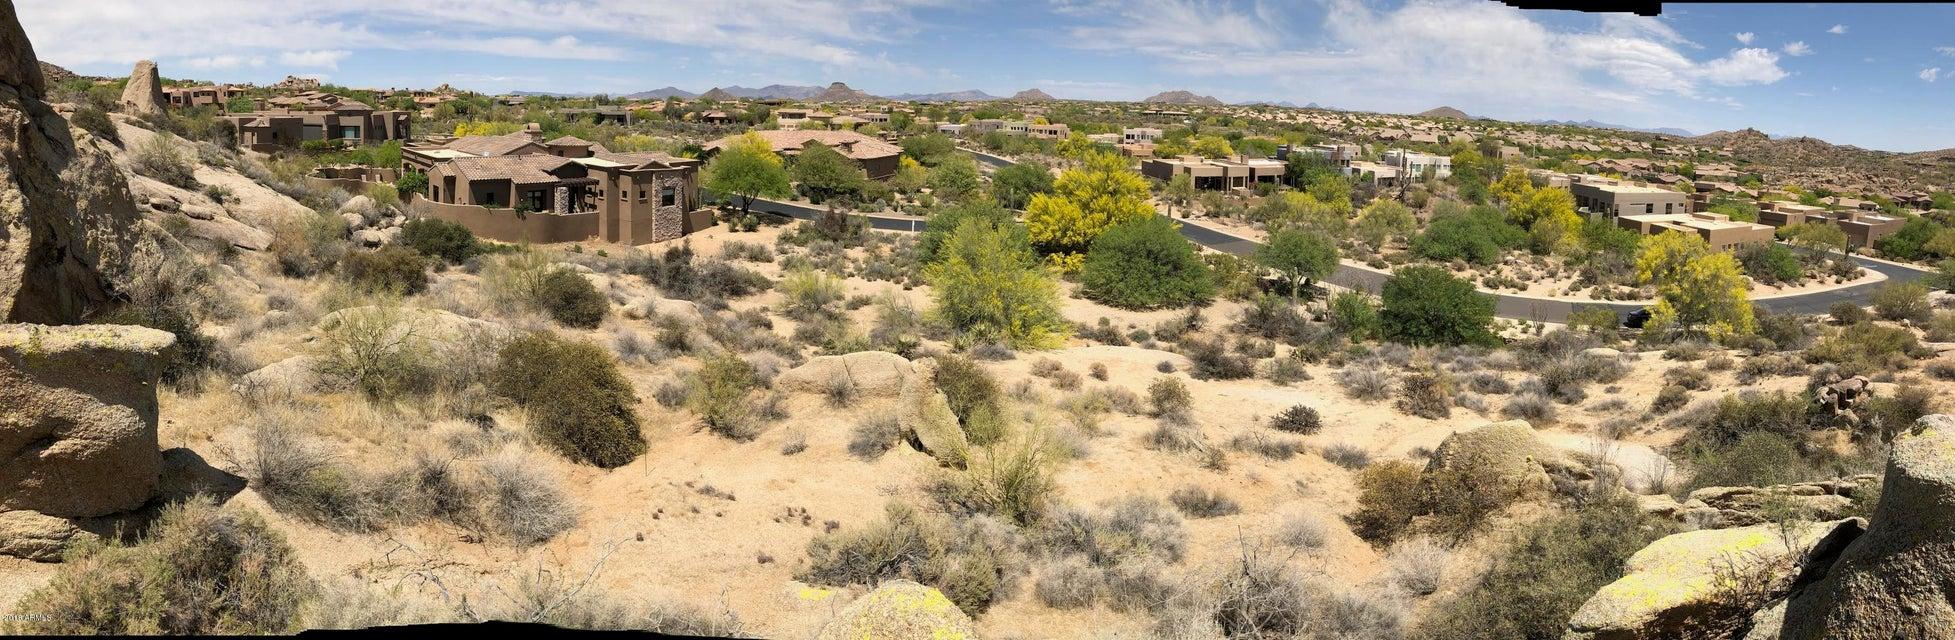 10799 E HEDGEHOG Place Scottsdale, AZ 85262 - MLS #: 5727853